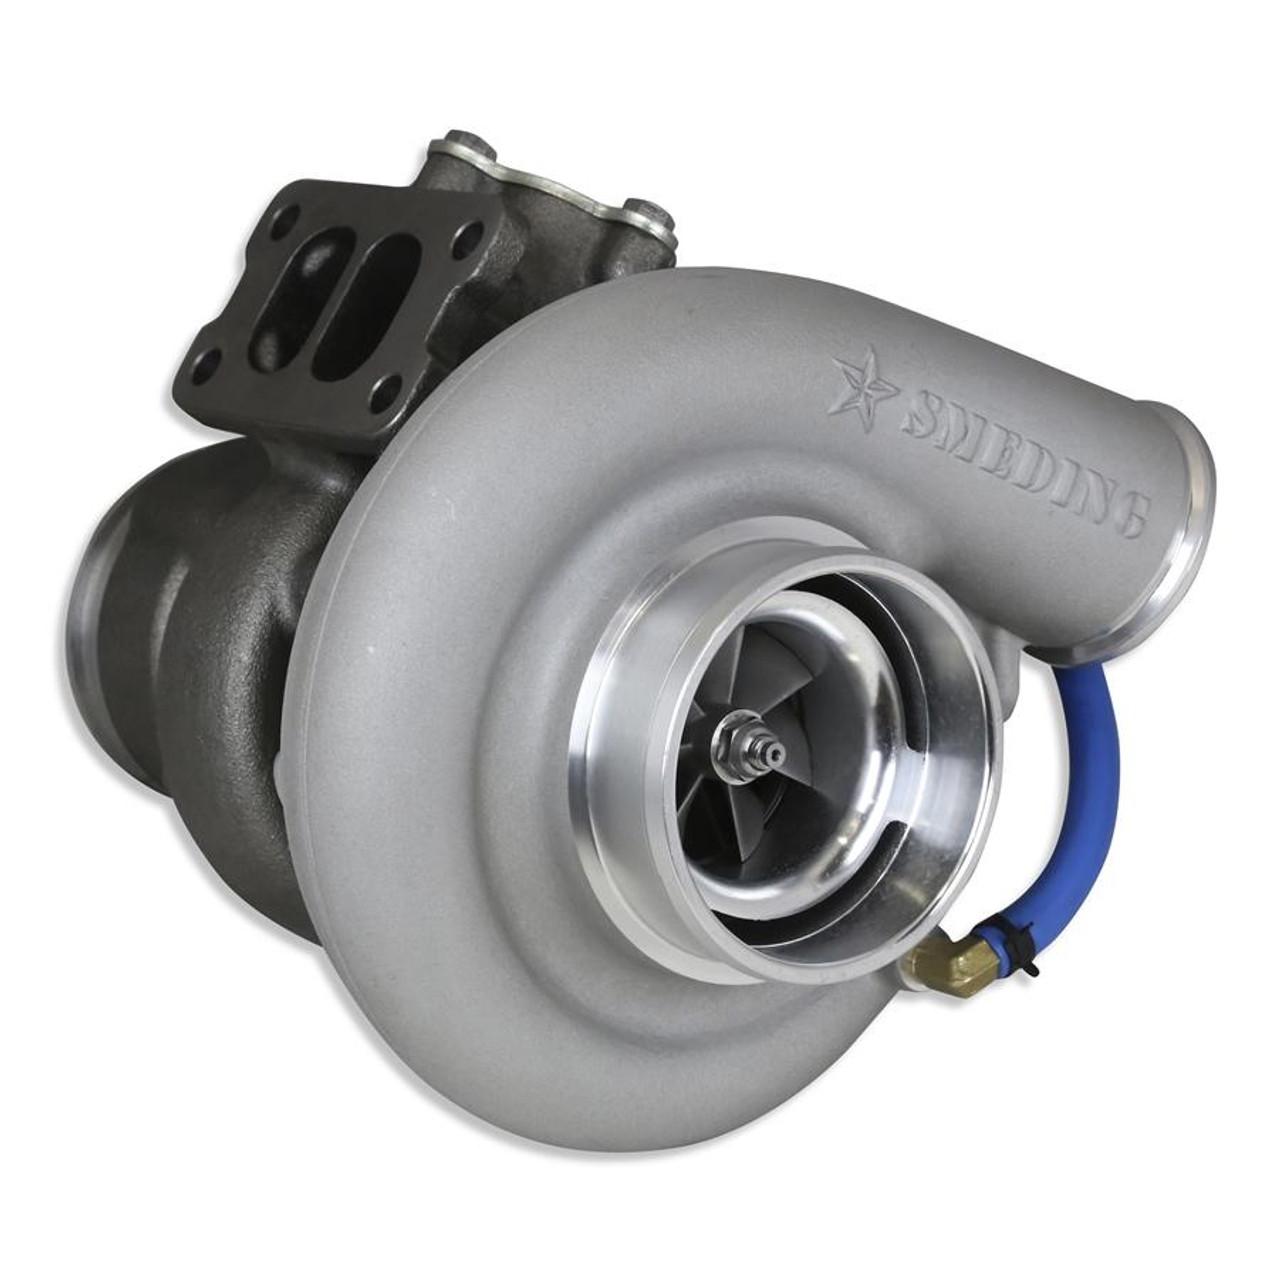 Smeding Diesel S363 Billet Drop in Turbo